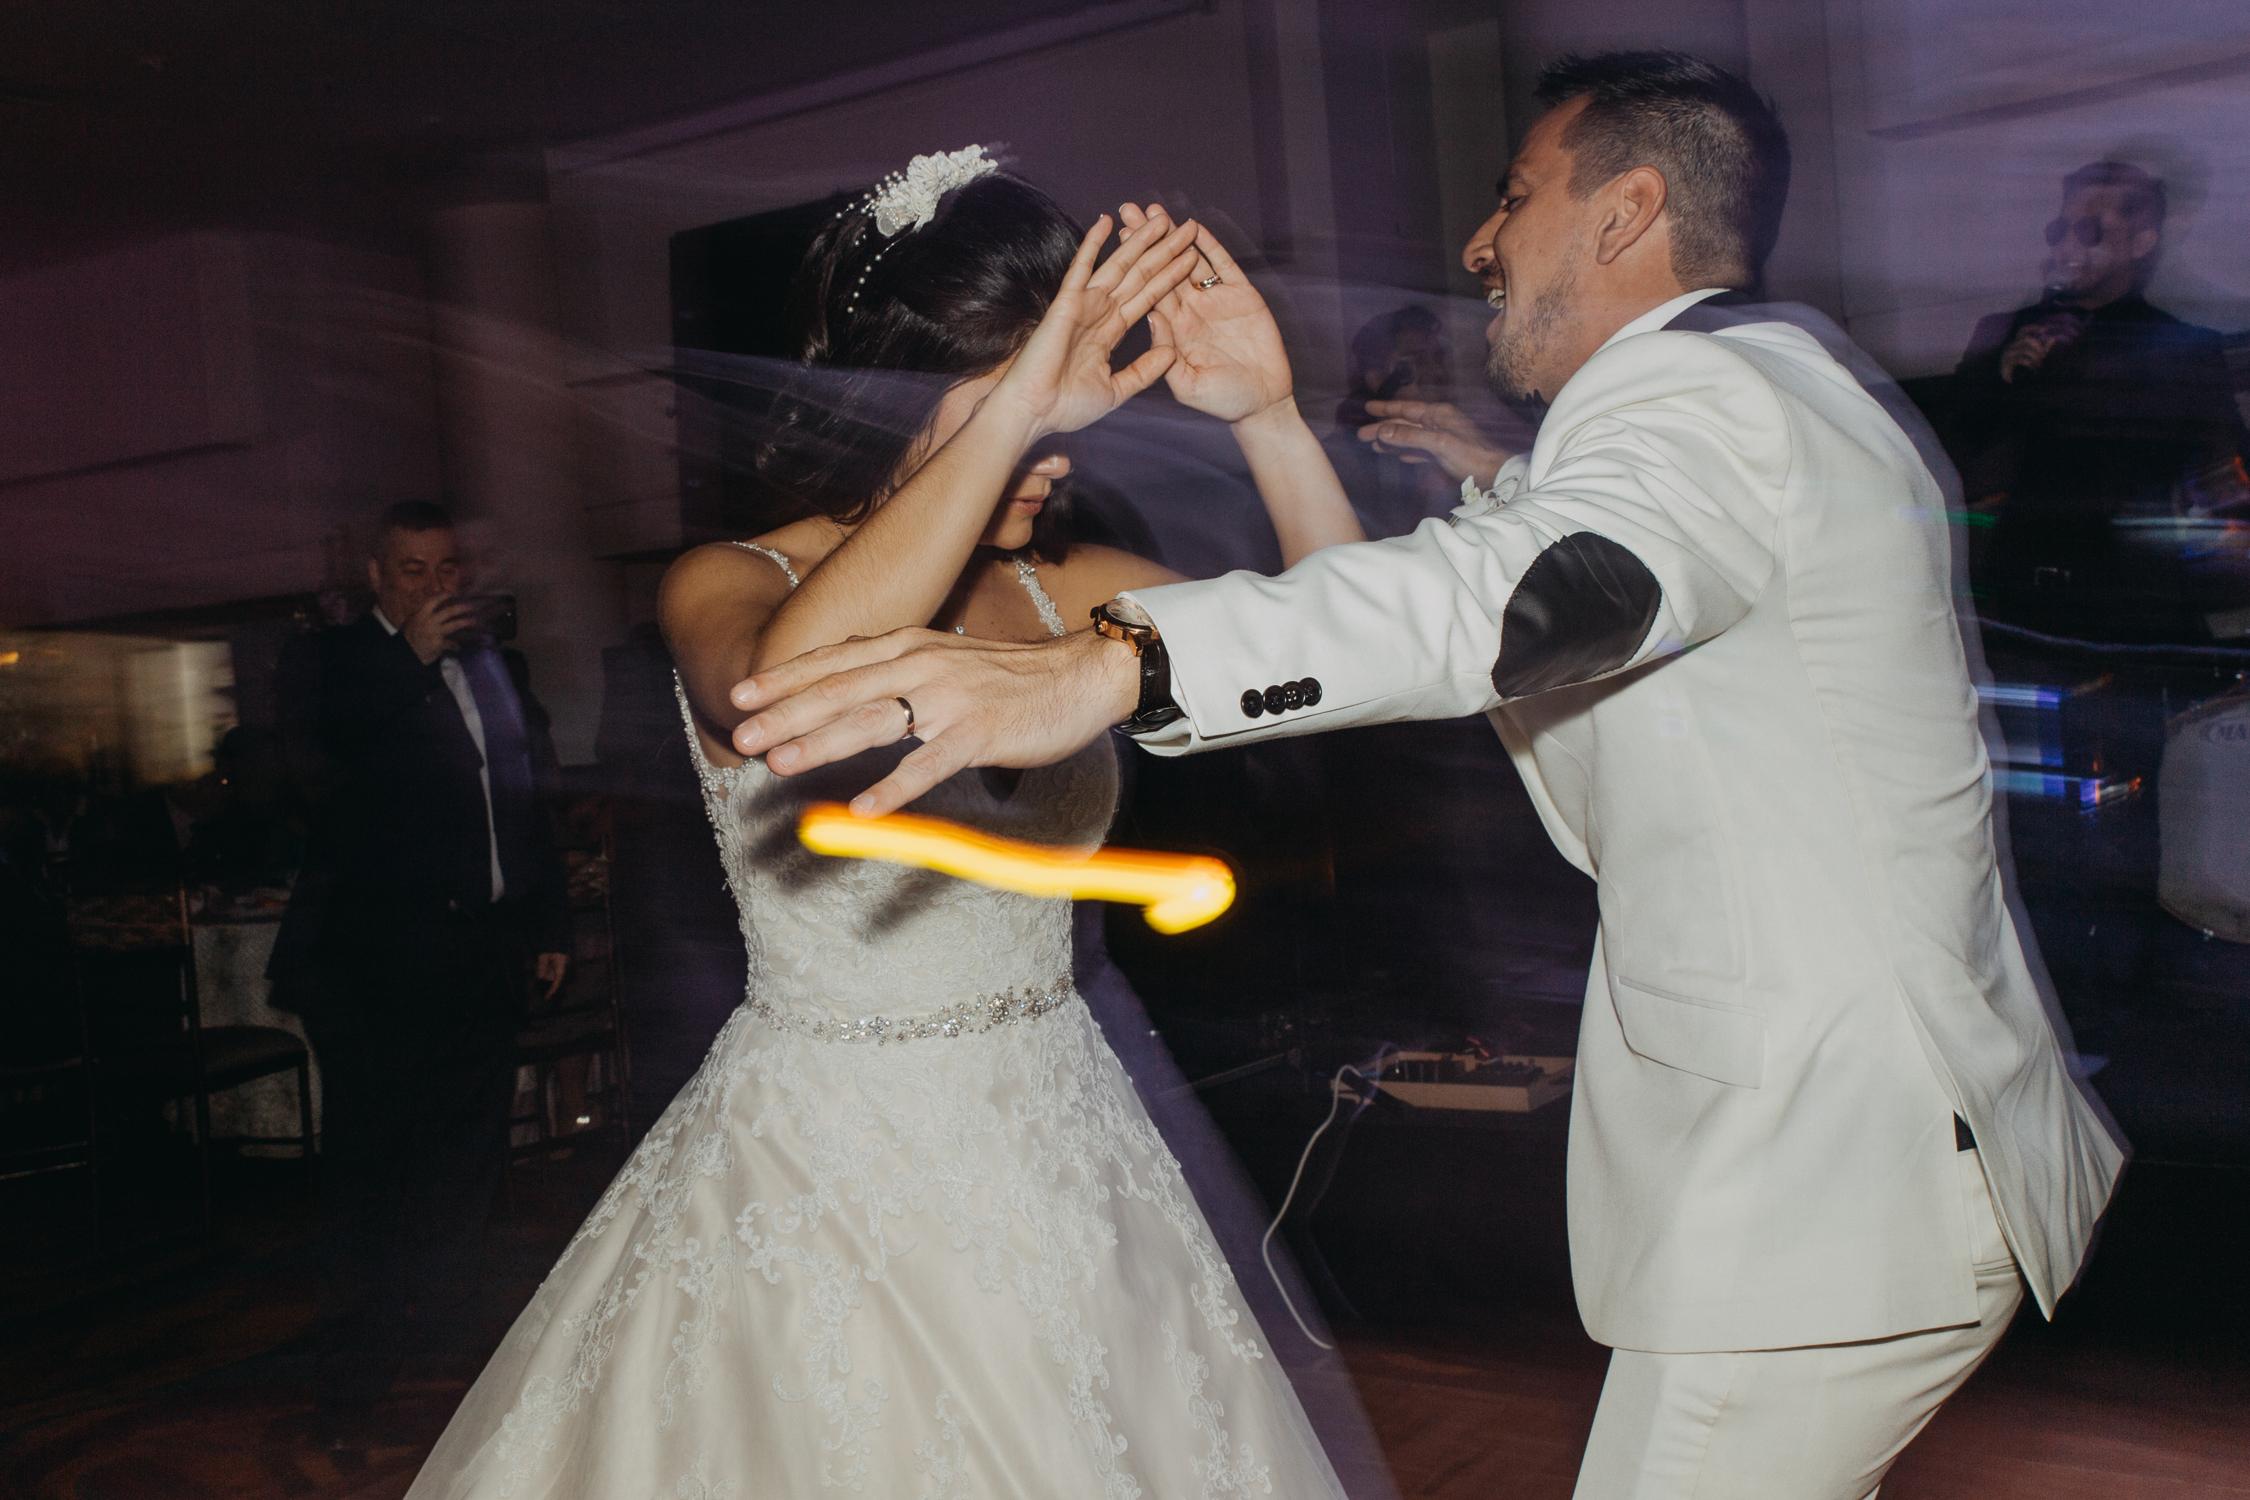 Michelle-Agurto-Fotografia-Bodas-Ecuador-Destination-Wedding-Photographer-Daniela-Dirk-76.JPG